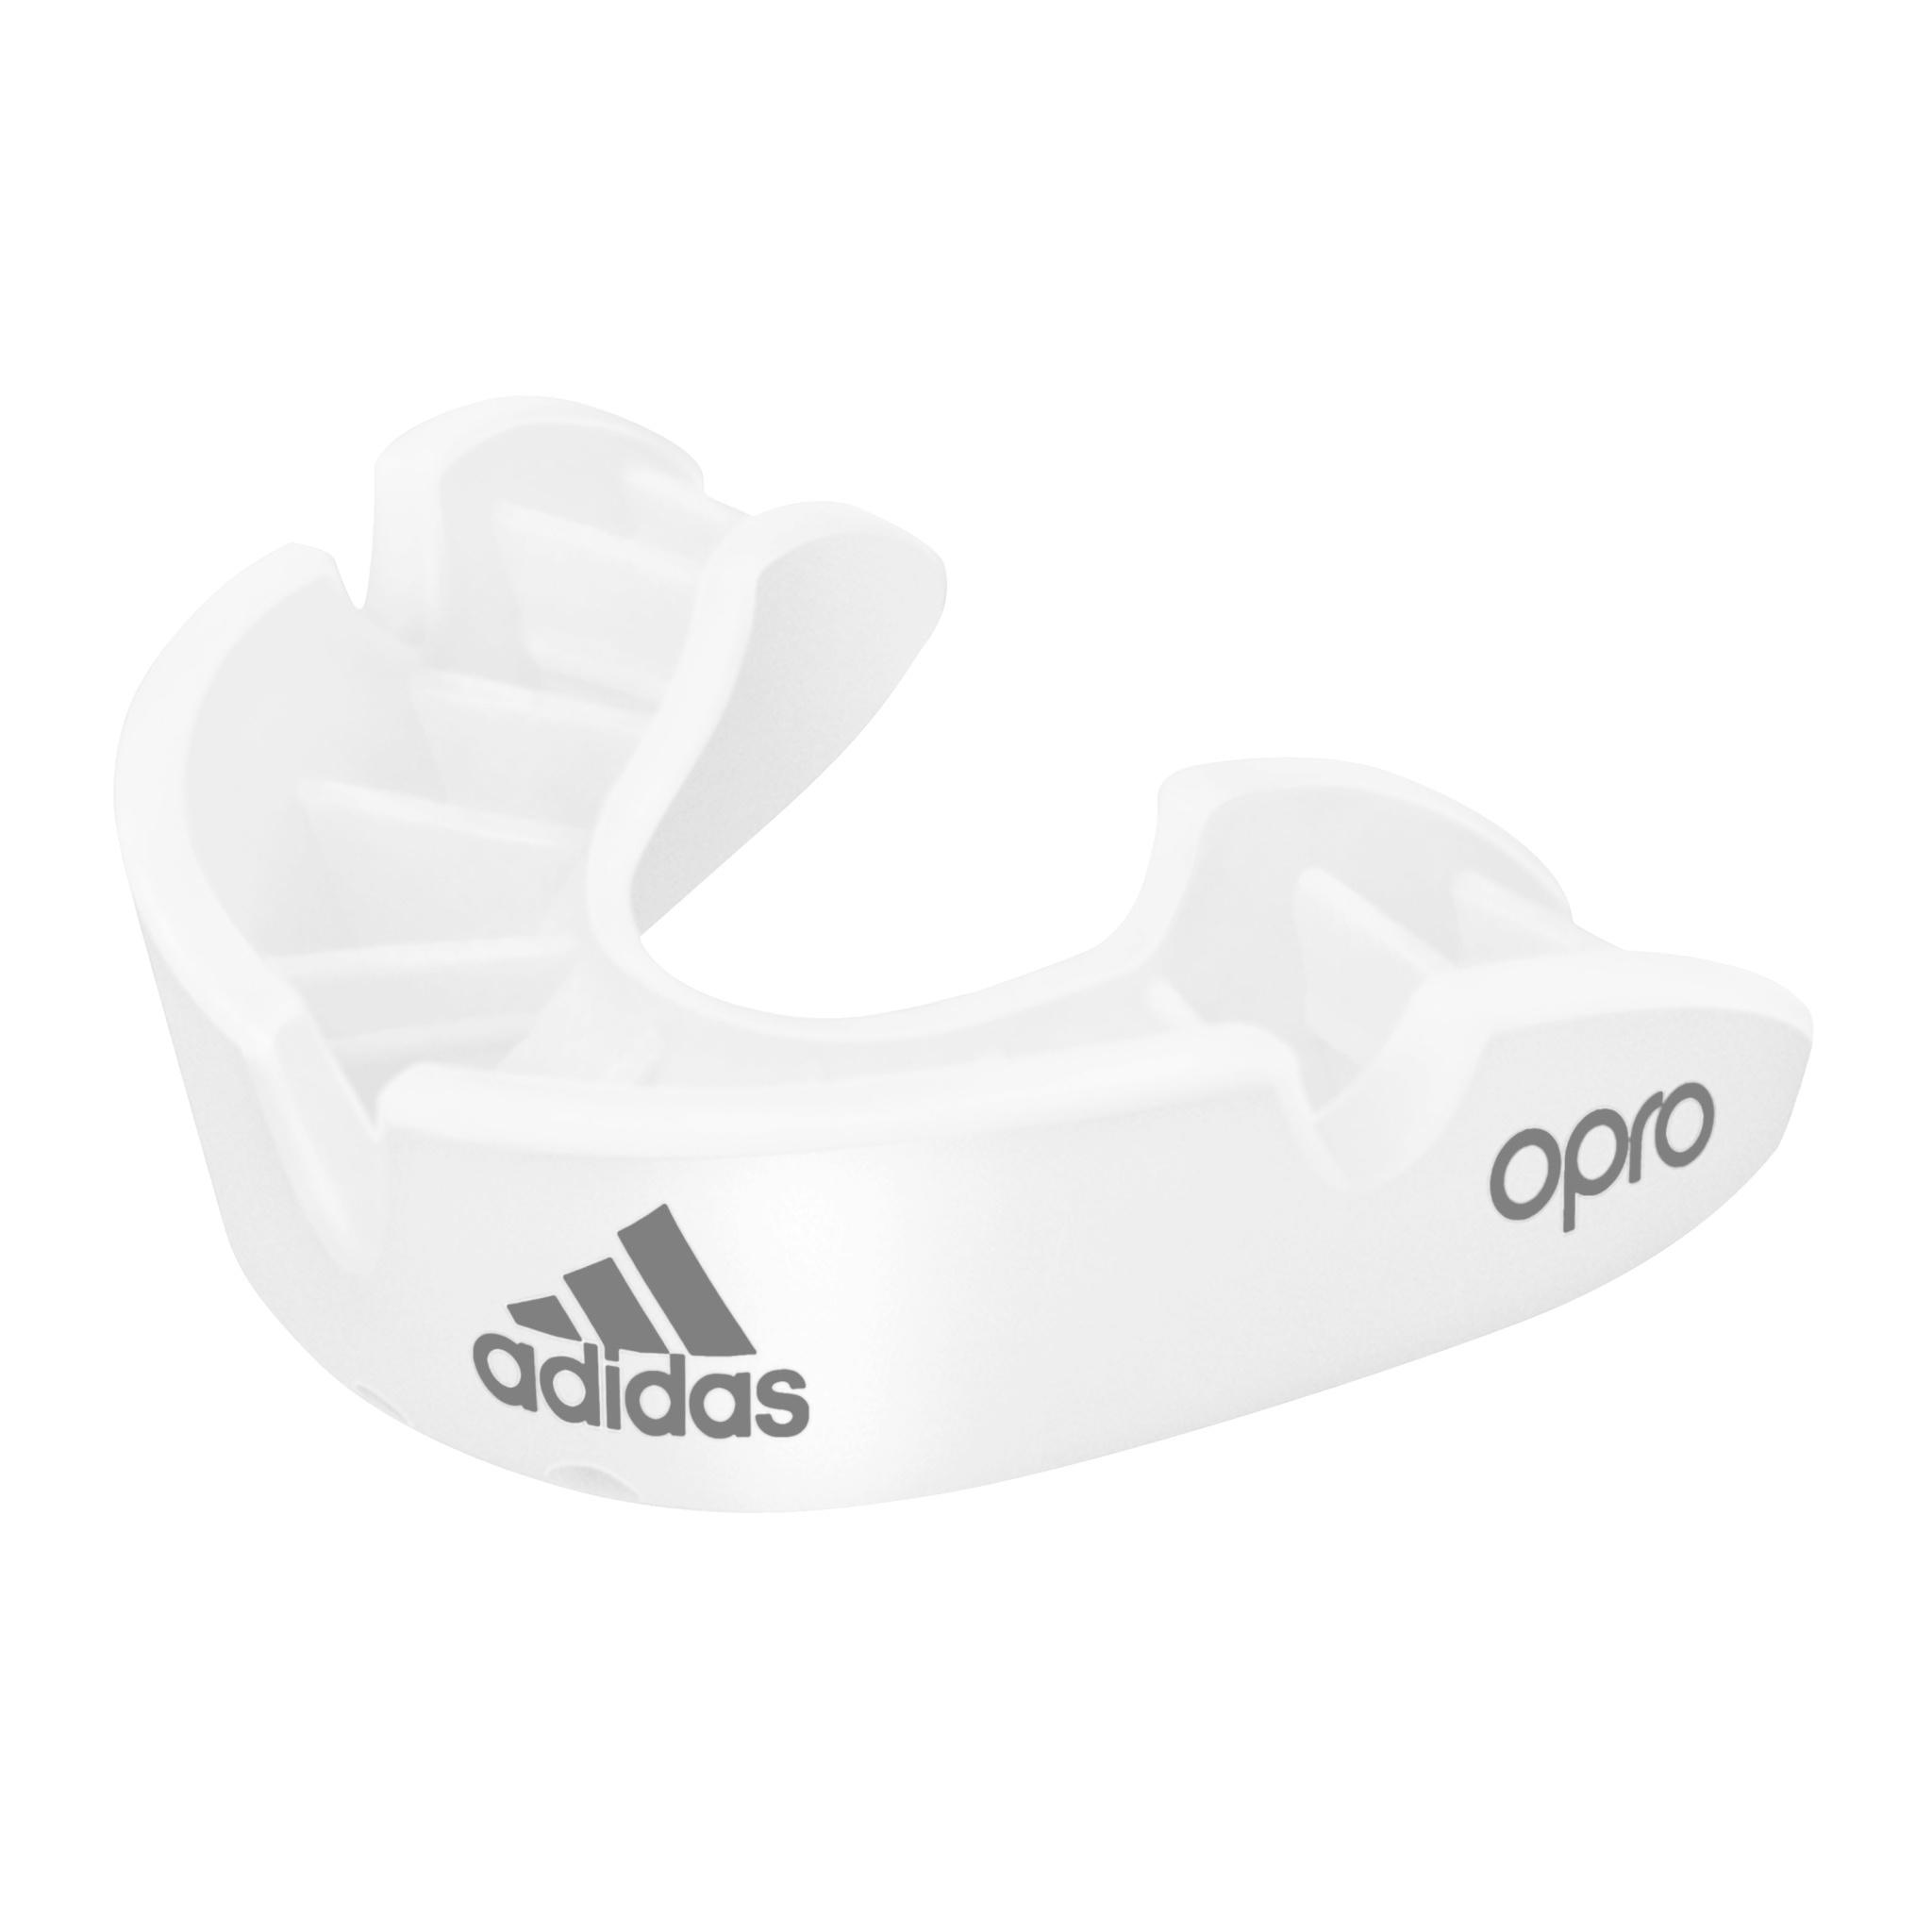 Adidas Adidas mouthguard  brons wit